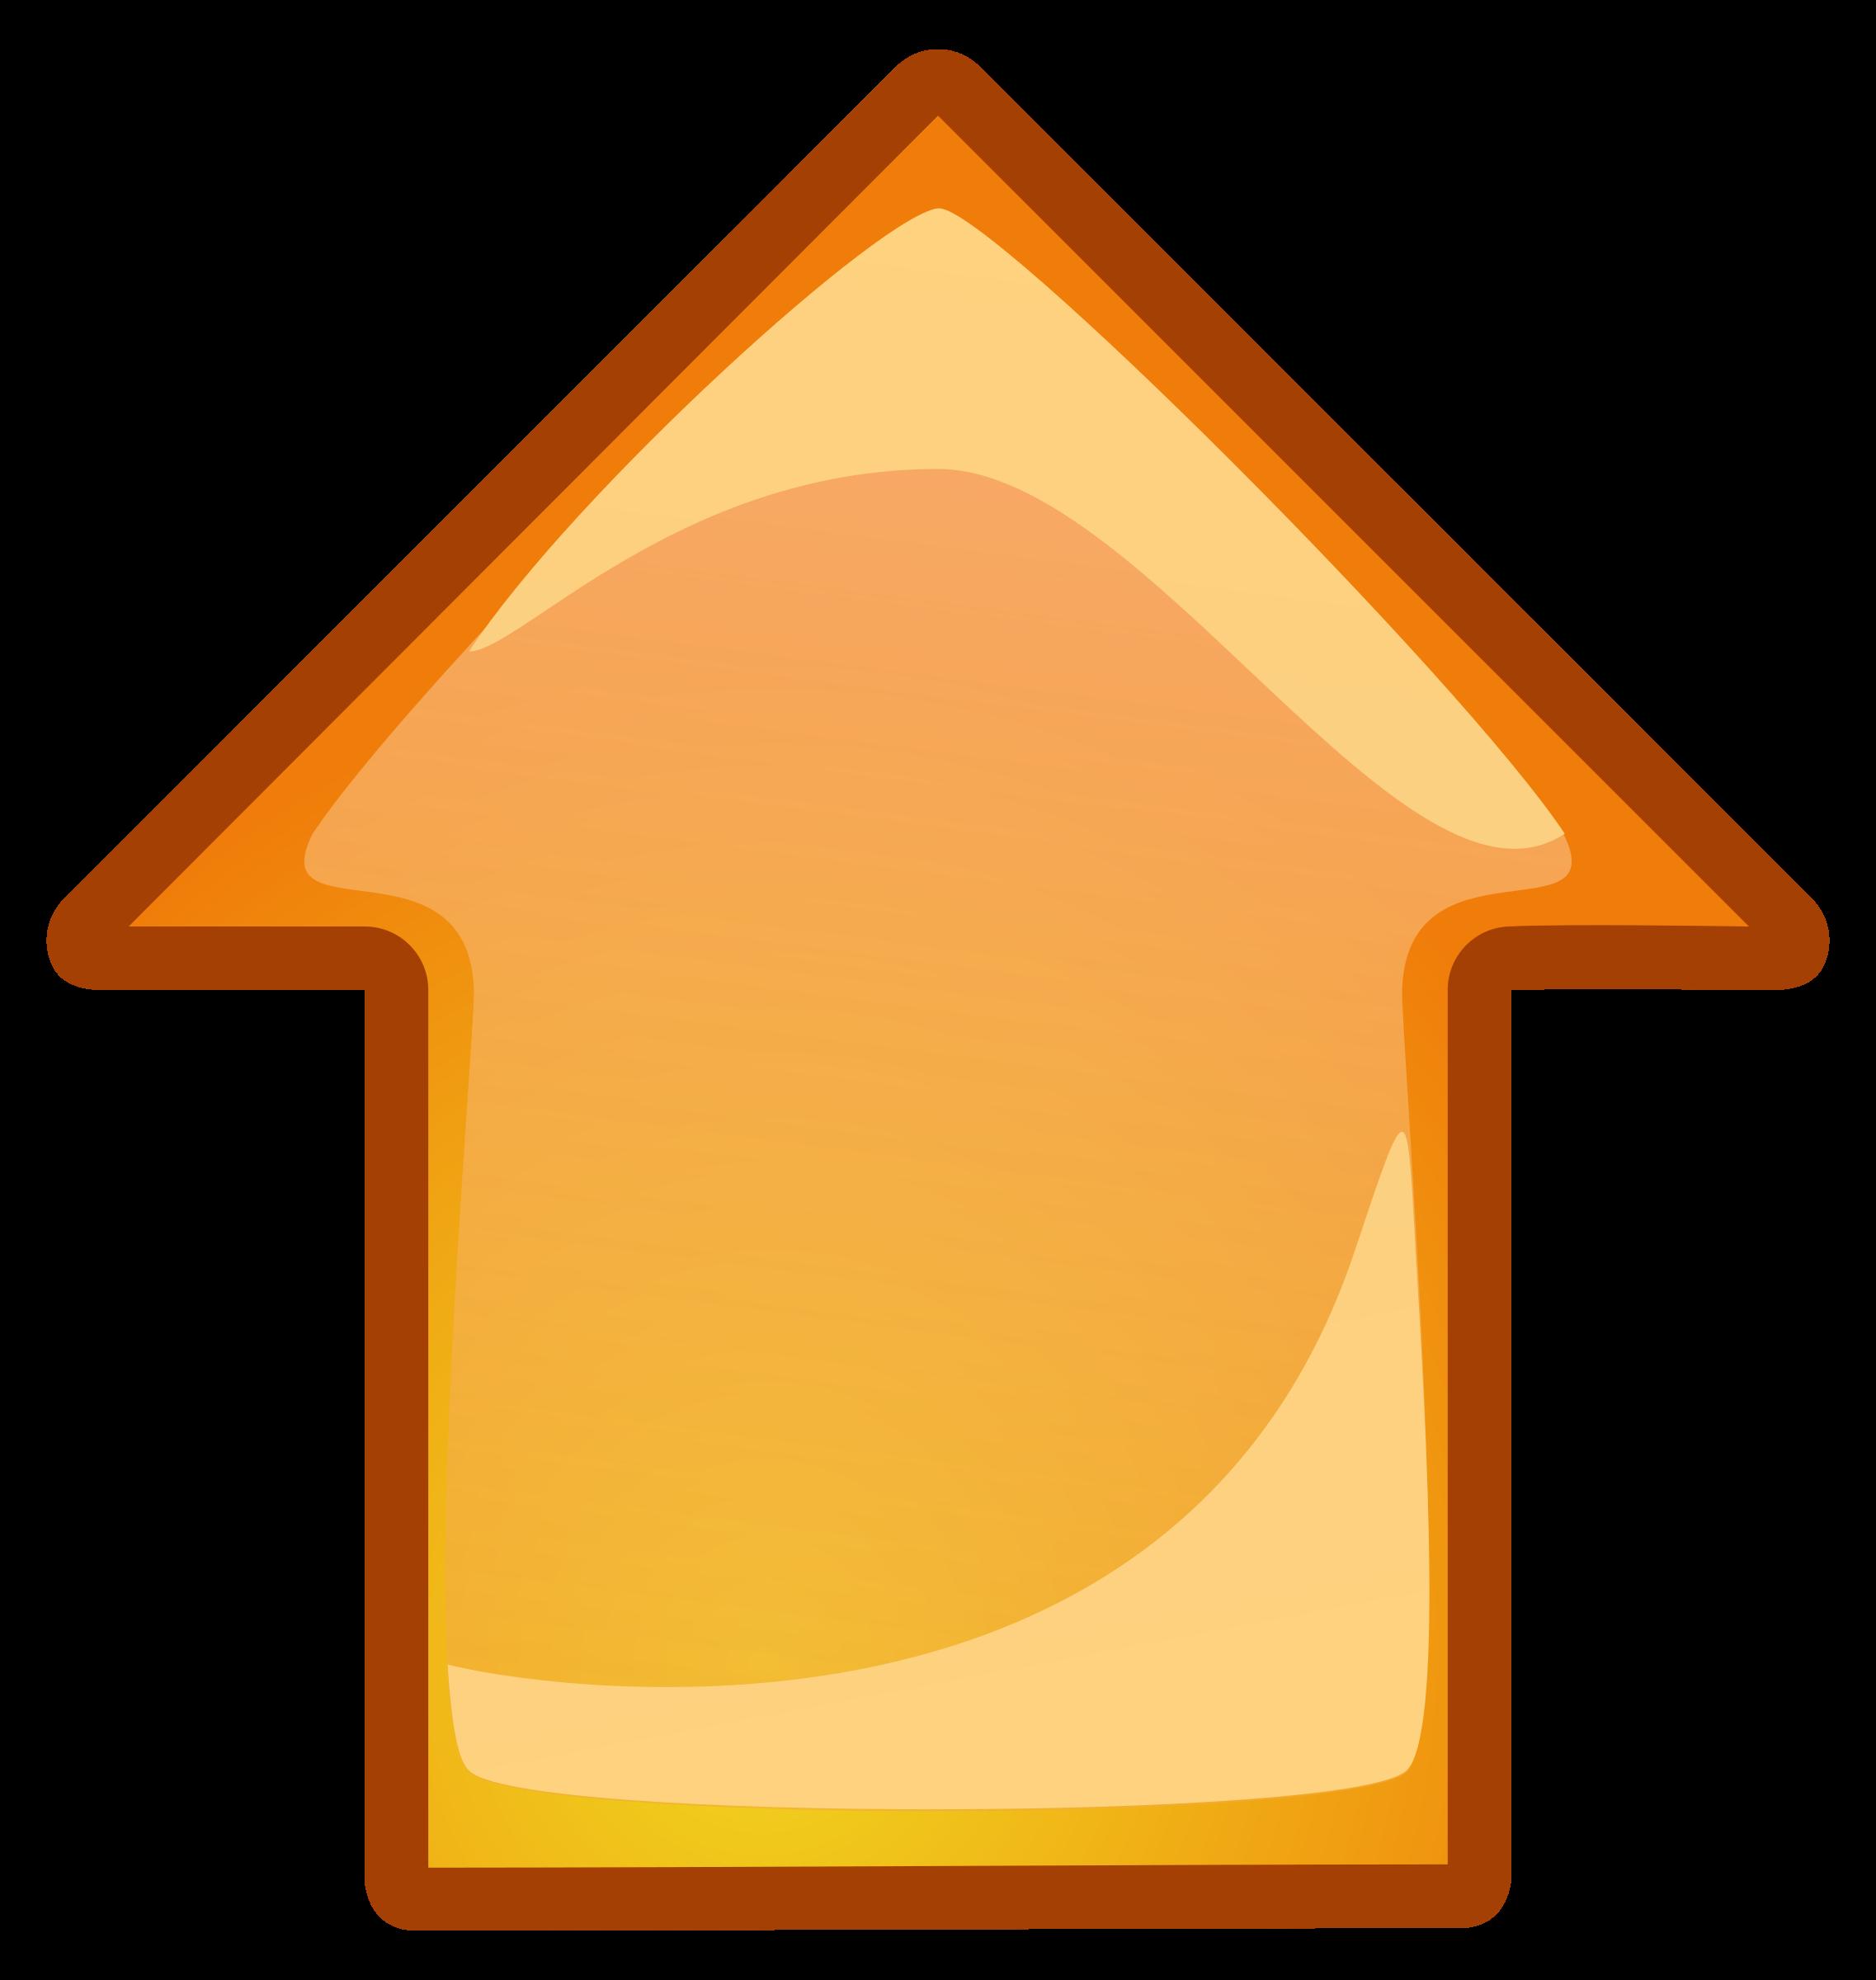 Orange big image png. Up clipart arrow